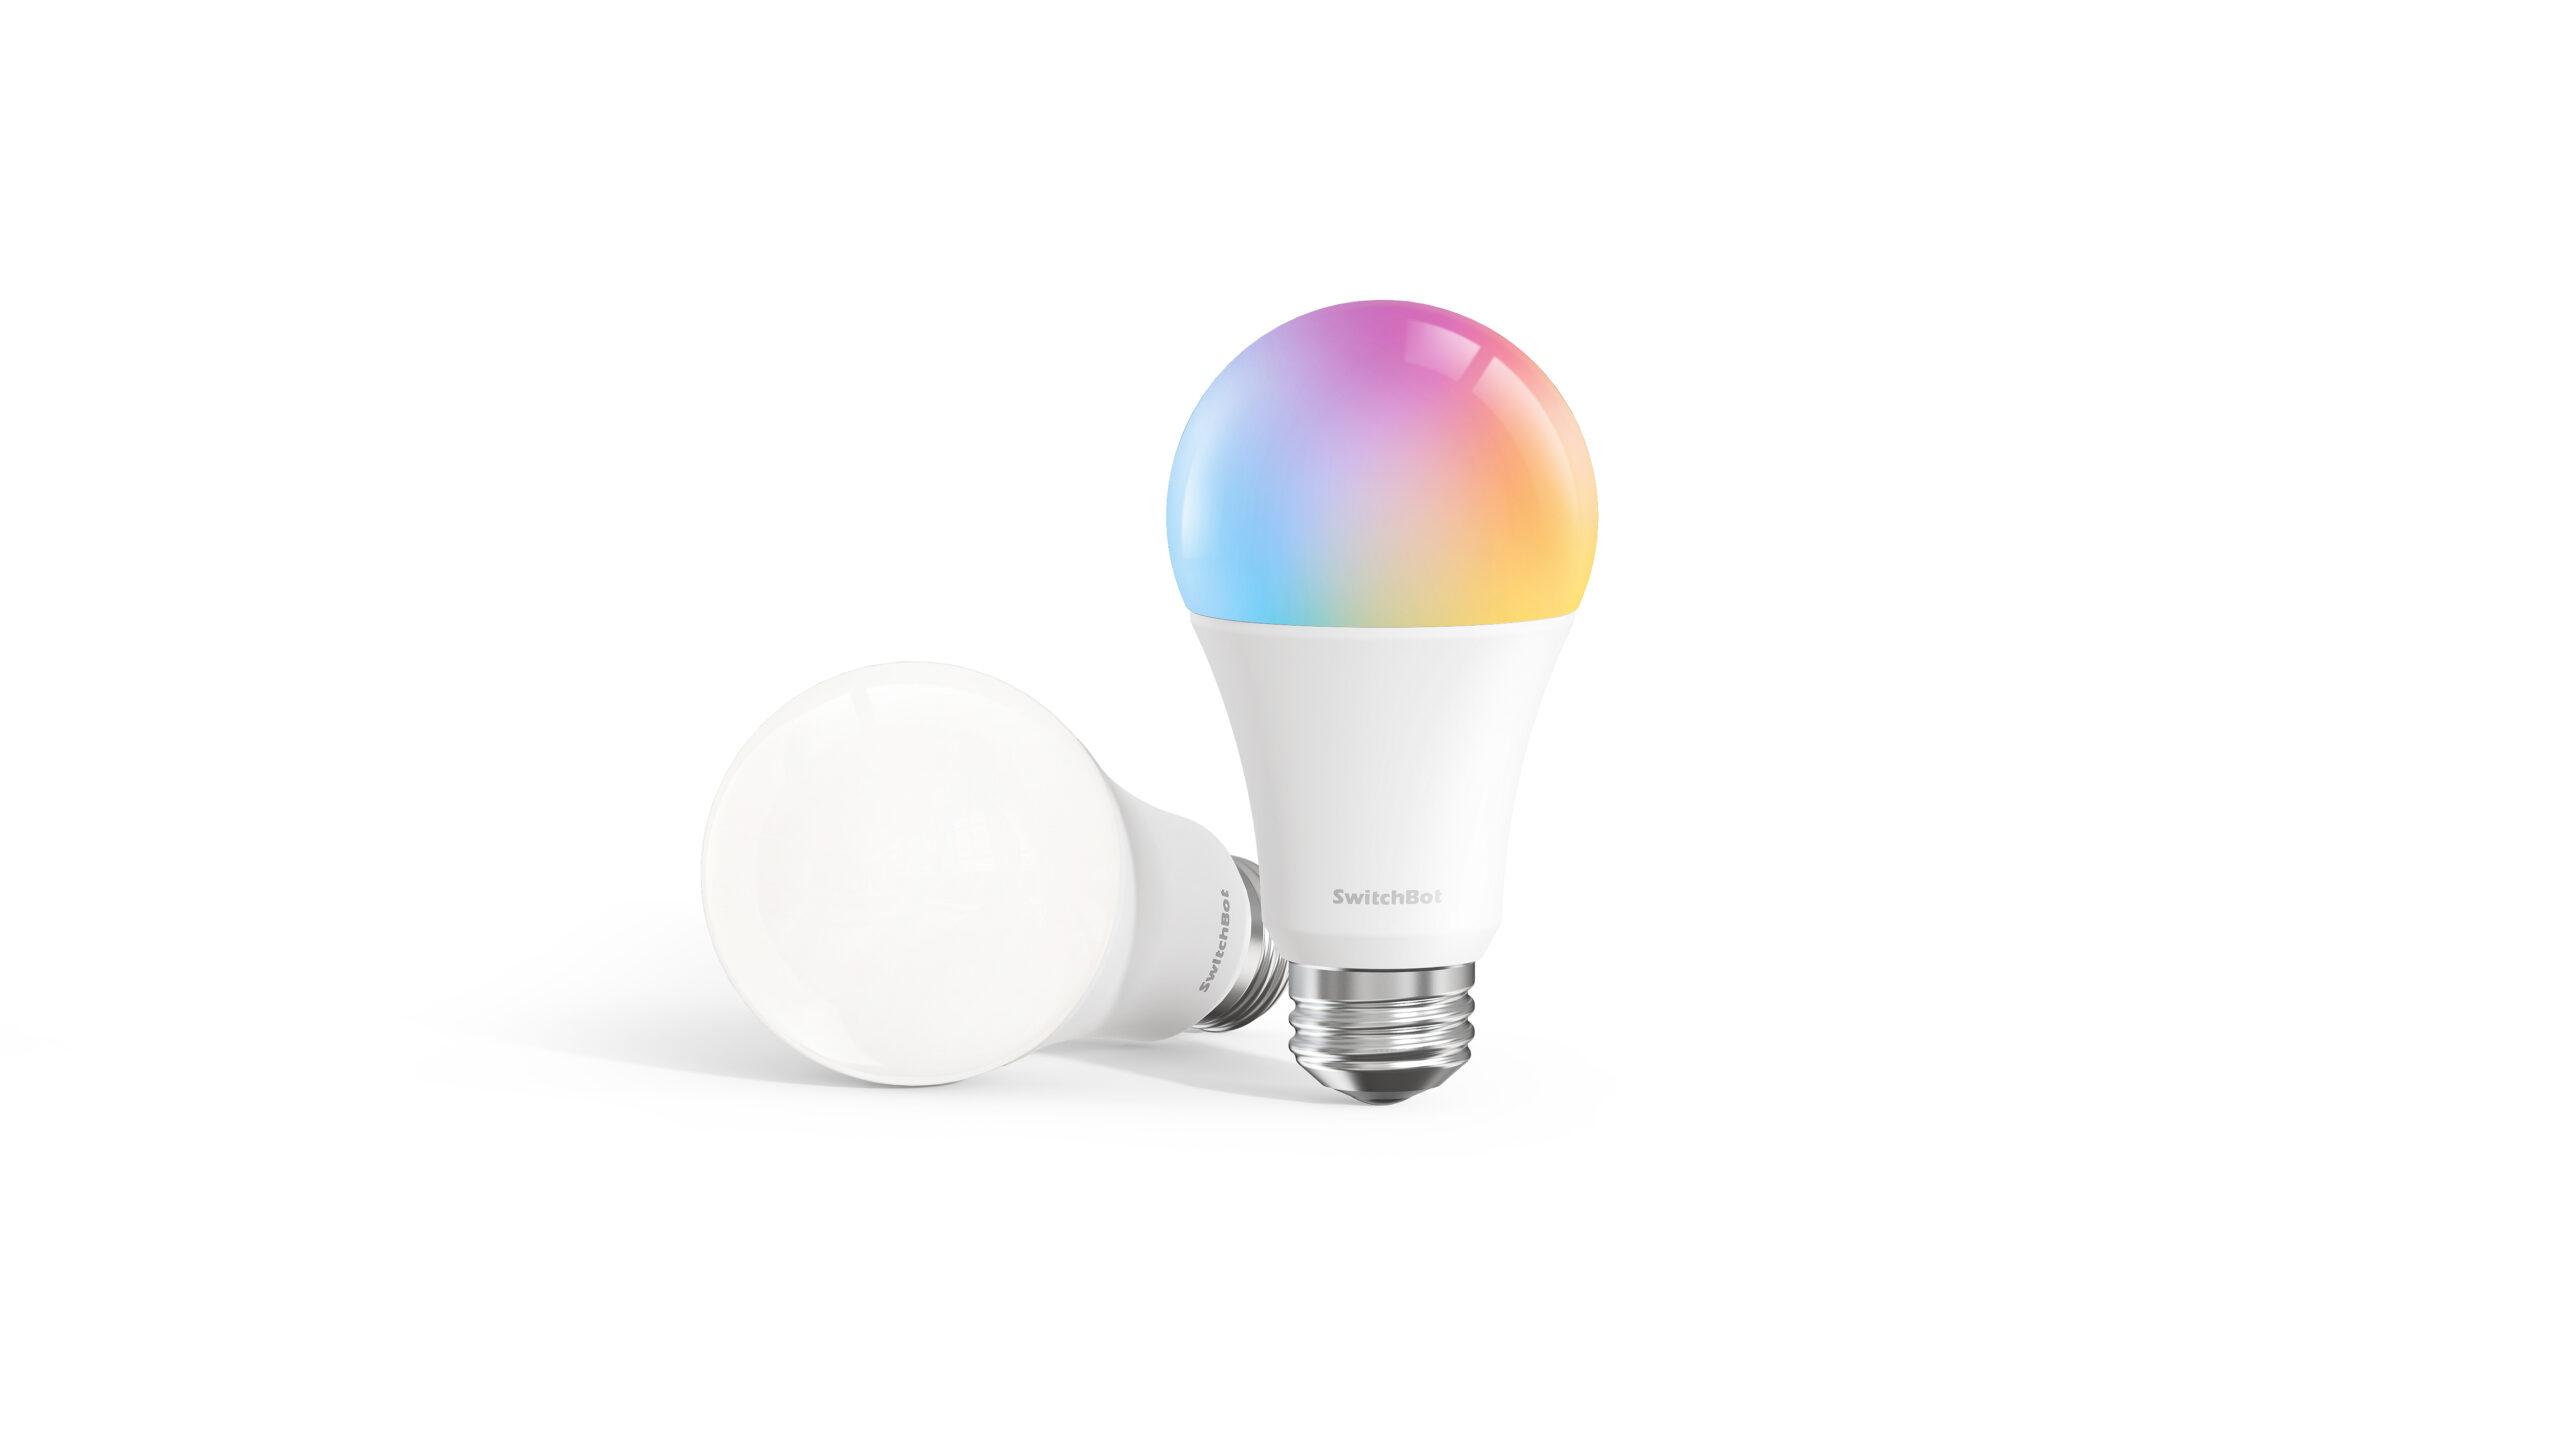 SwitchBot Color LED mit e27 Sockel dimmbar